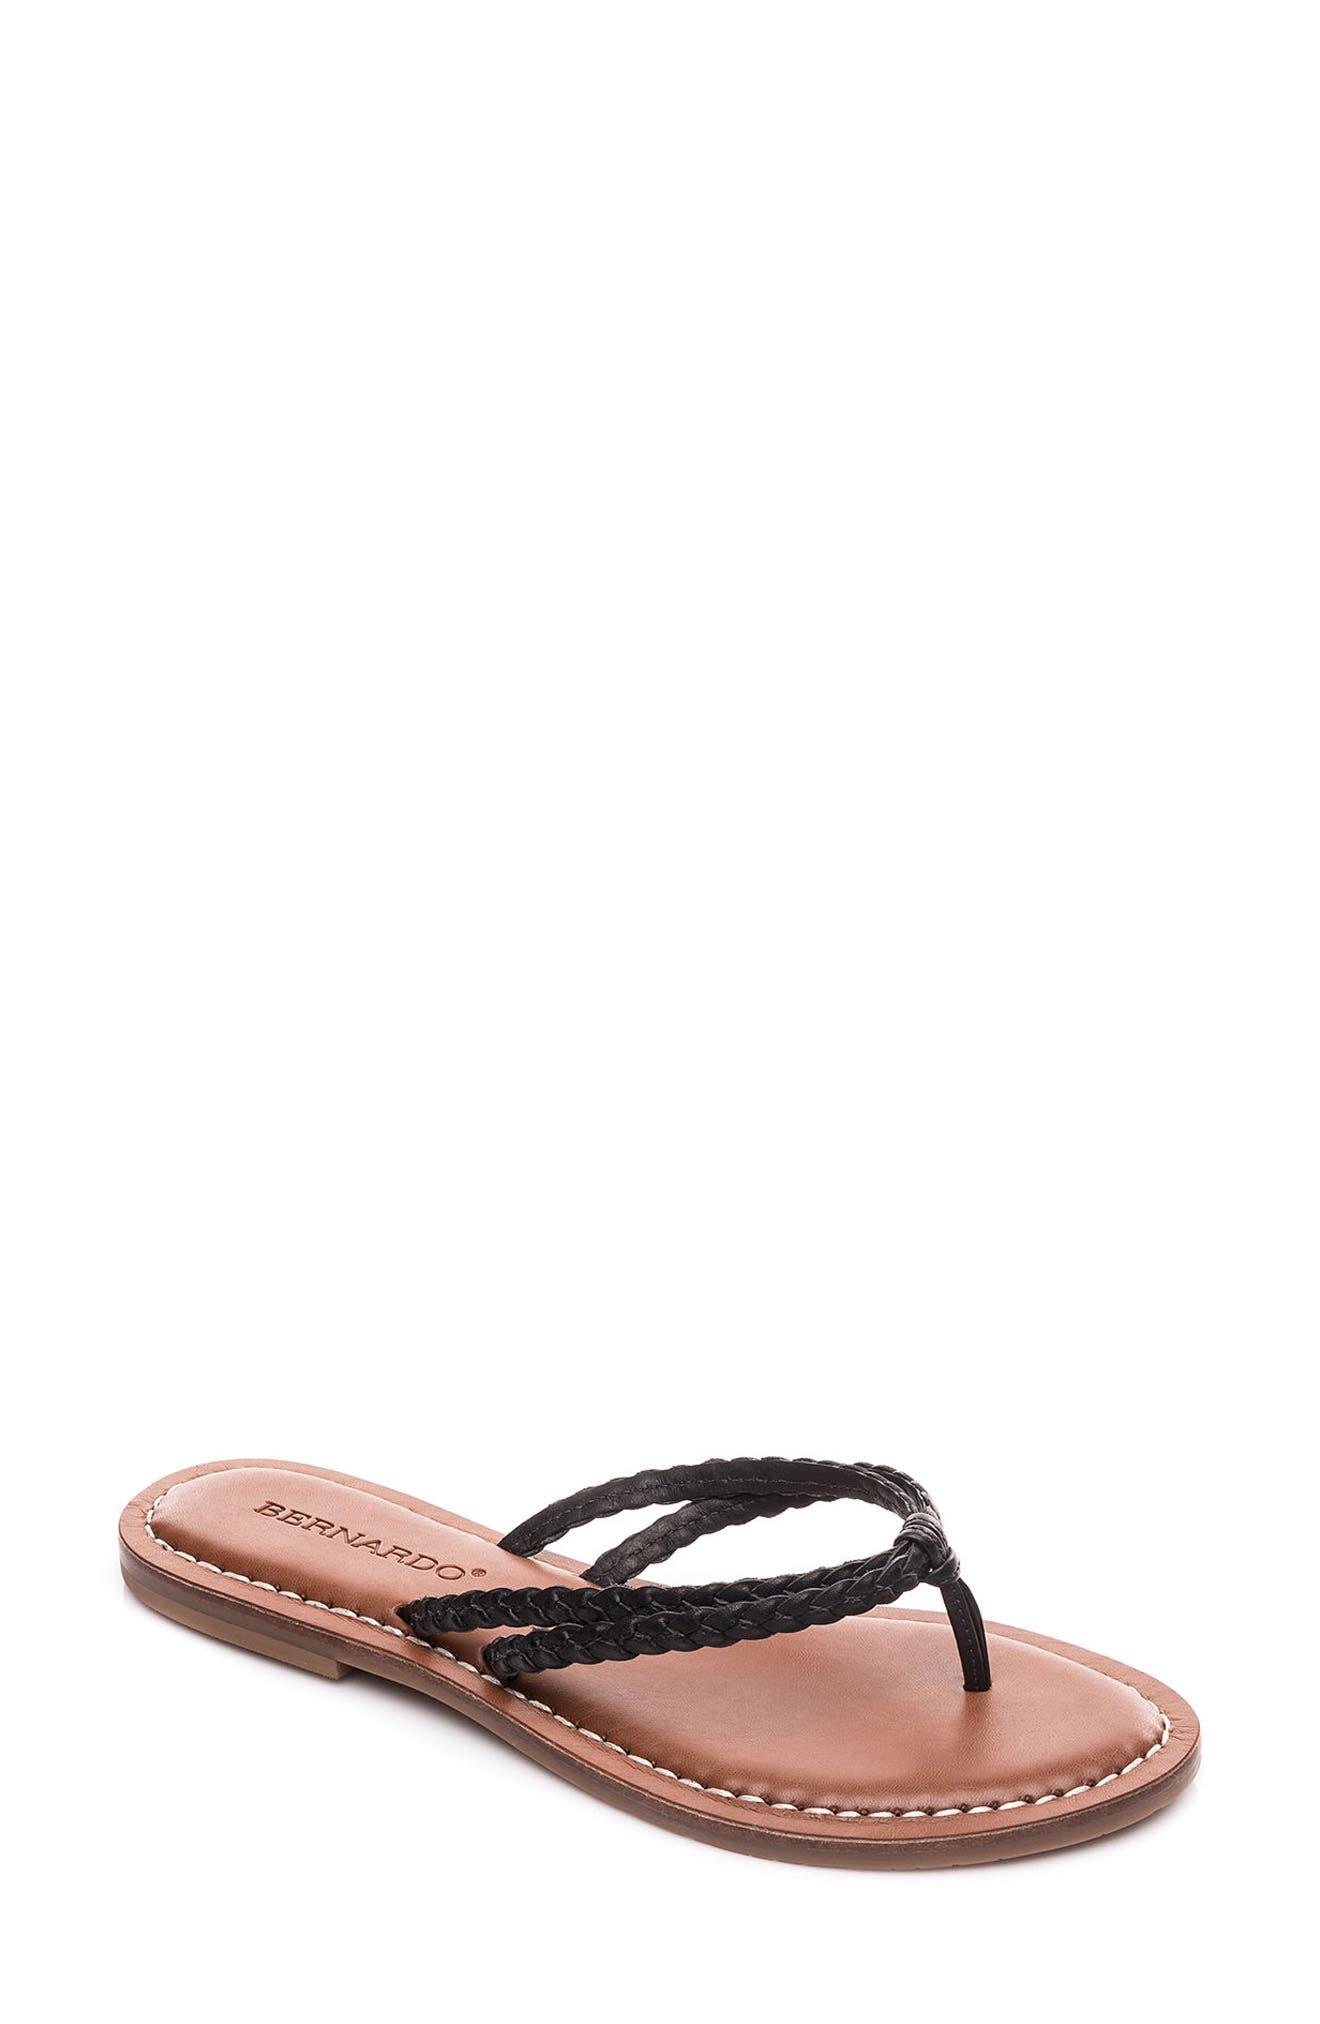 Bernardo Greta Braided Strap Sandal,                             Main thumbnail 1, color,                             Black Leather